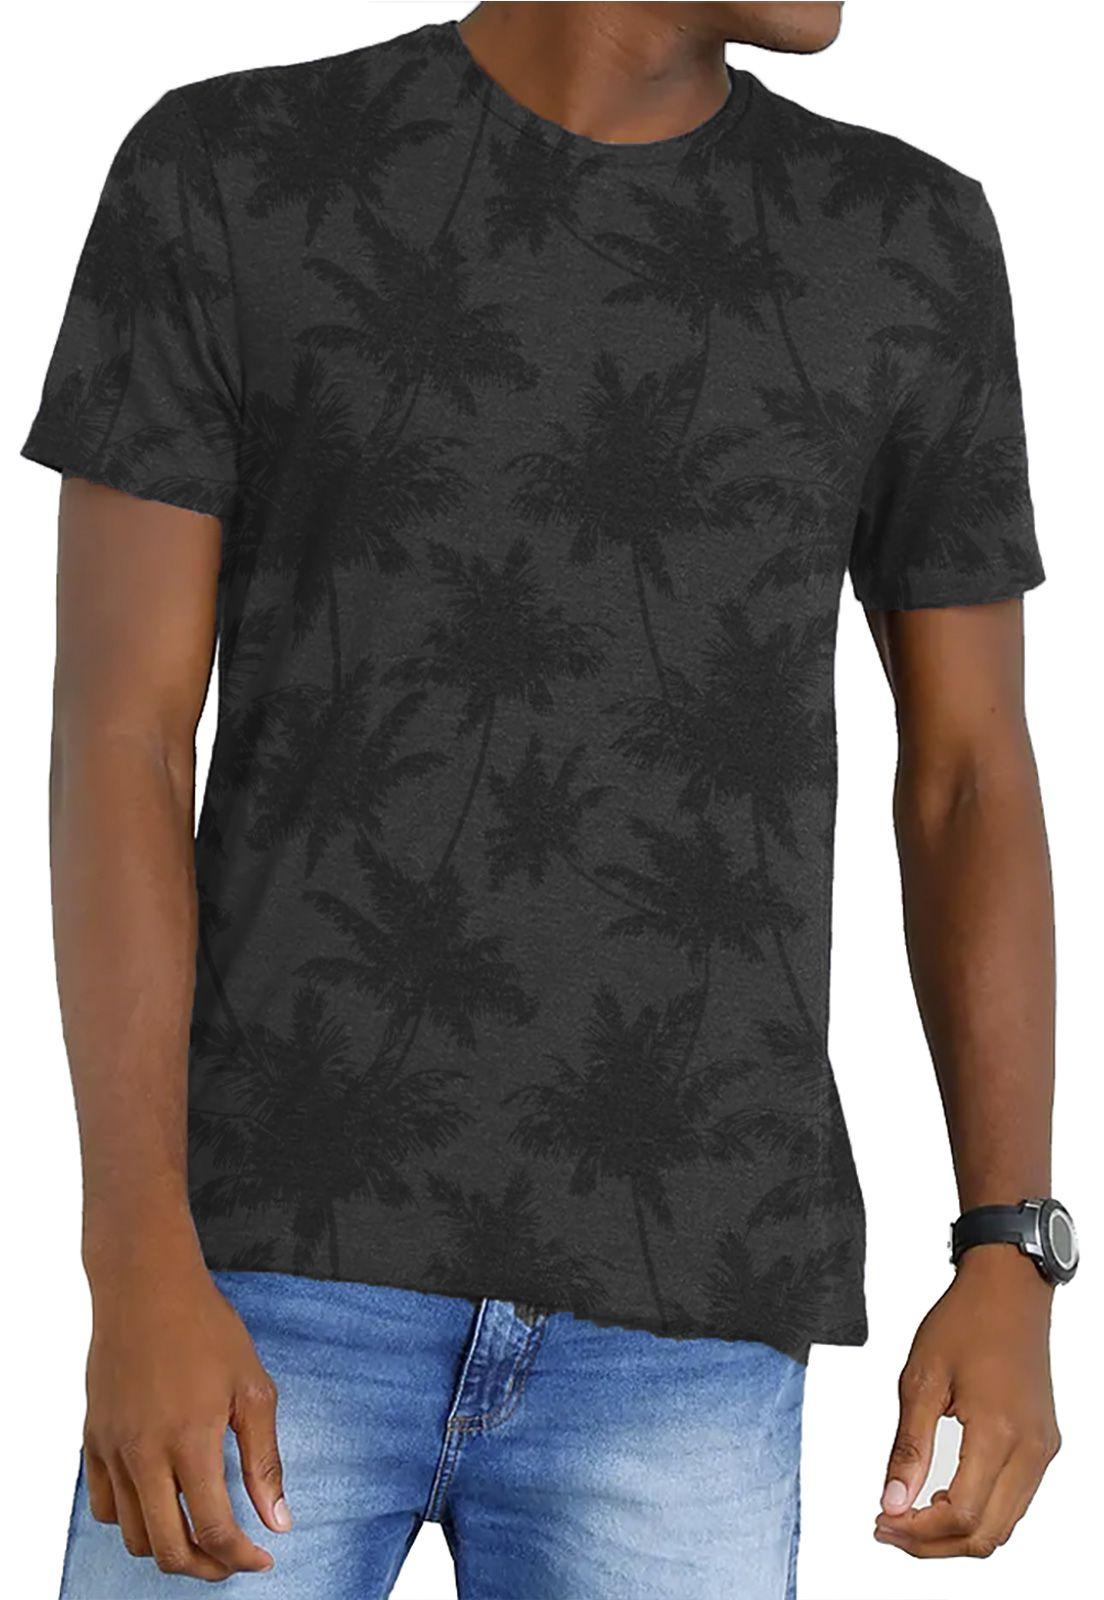 Camiseta Amazônia Garrafa Pet Corrido Coqueiros - Preto